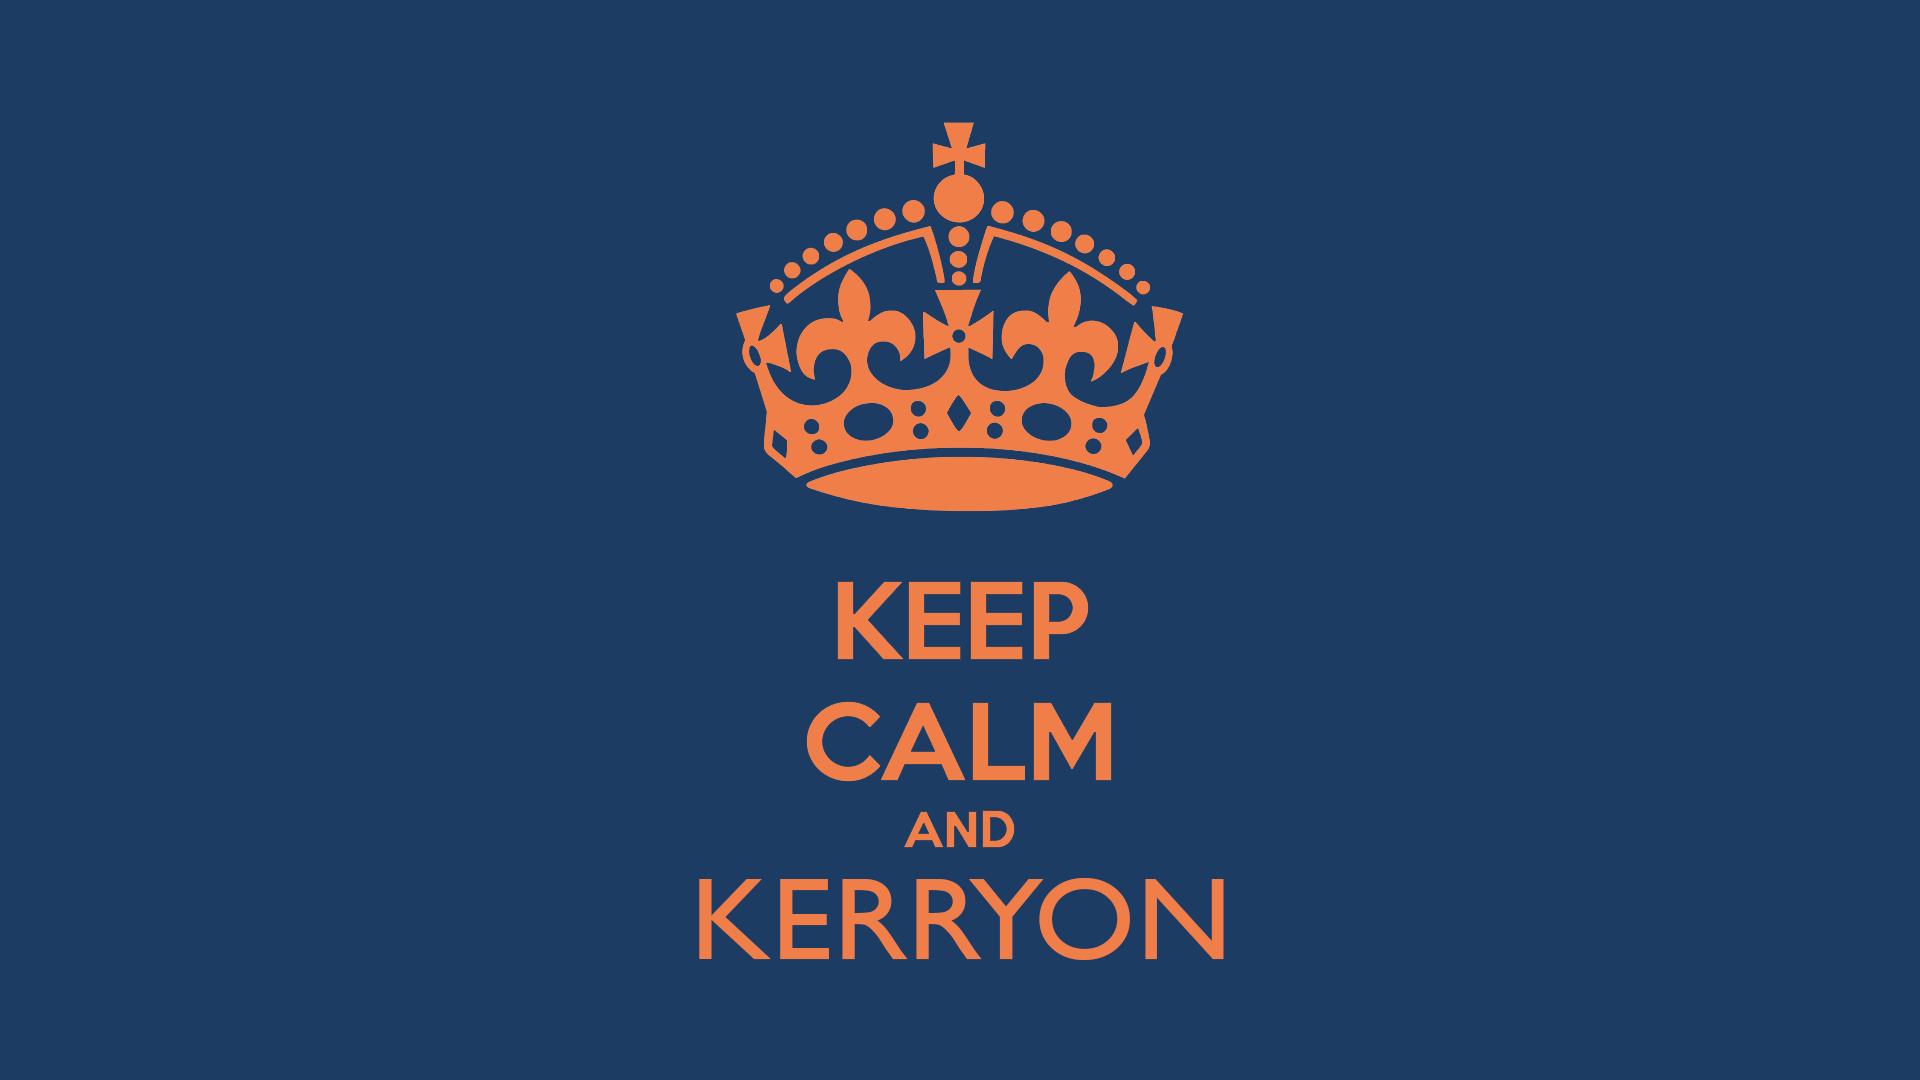 keep calm and kerryon auburn university by auburnfan45190 on rh auburnfan45190 deviantart com Auburn University Logo Auburn Desktop Logo